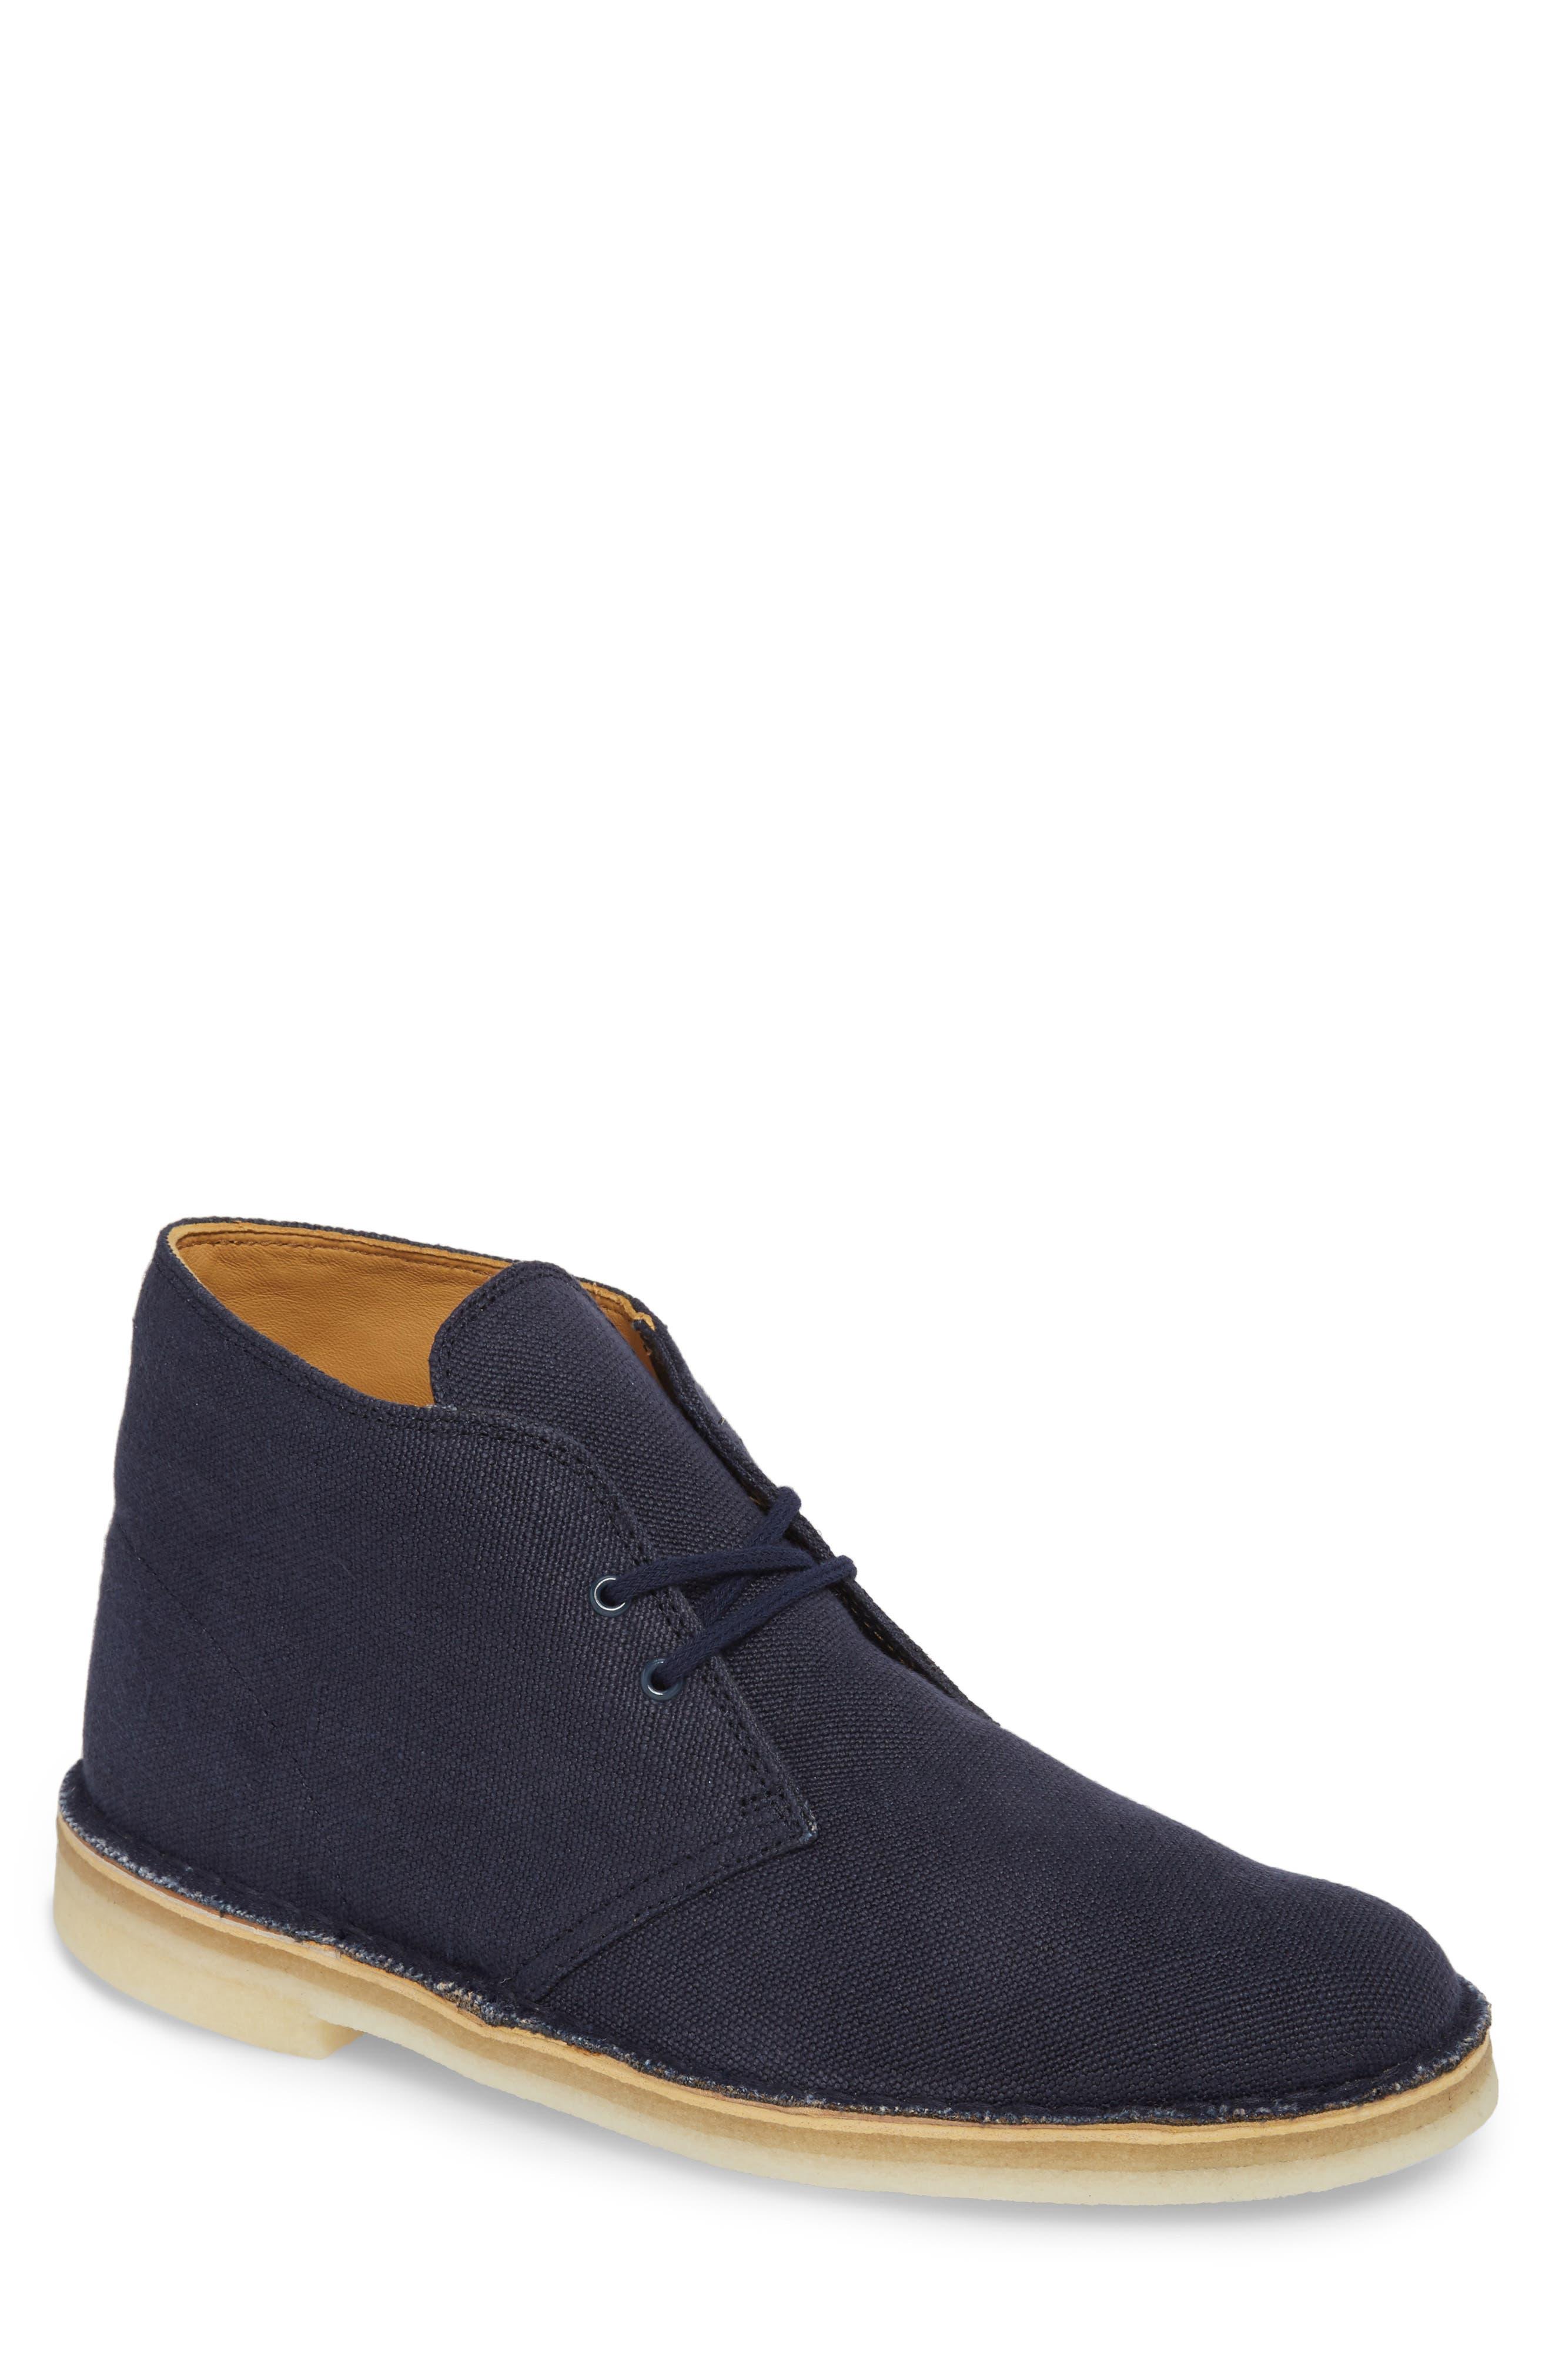 Clarks of England Desert Boot,                         Main,                         color, 480